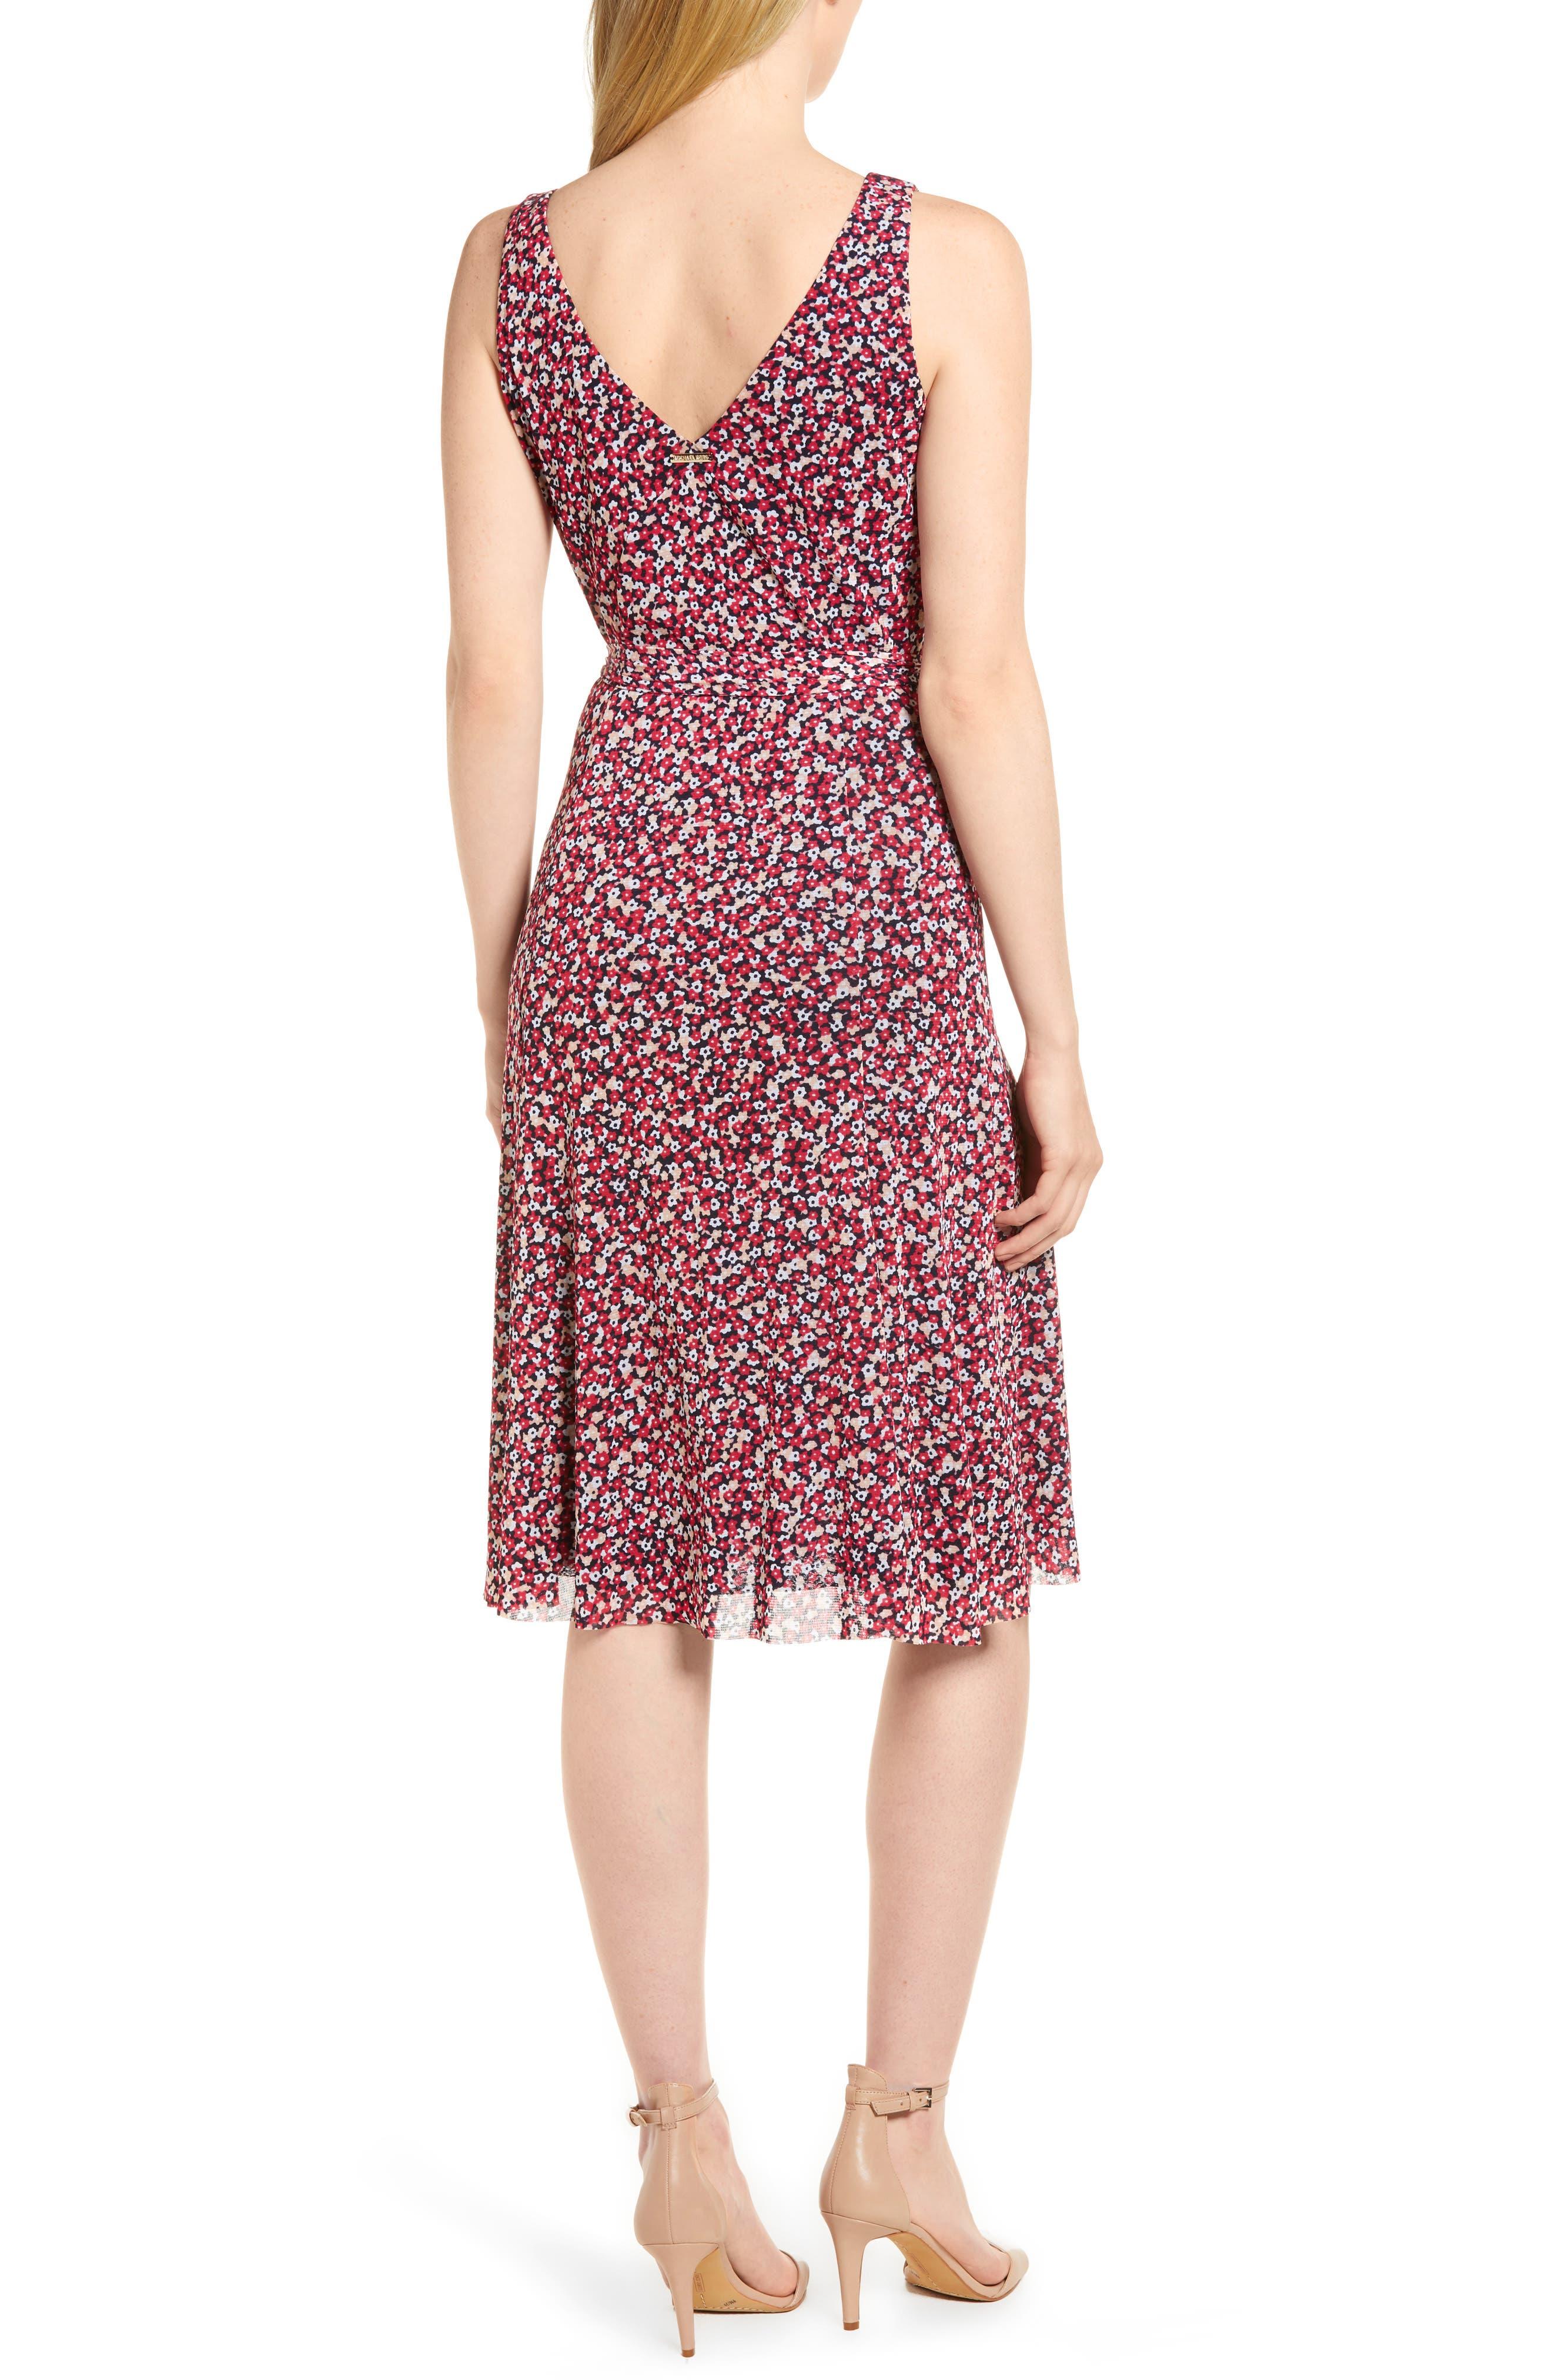 Floral Tank Dress,                             Alternate thumbnail 2, color,                             678